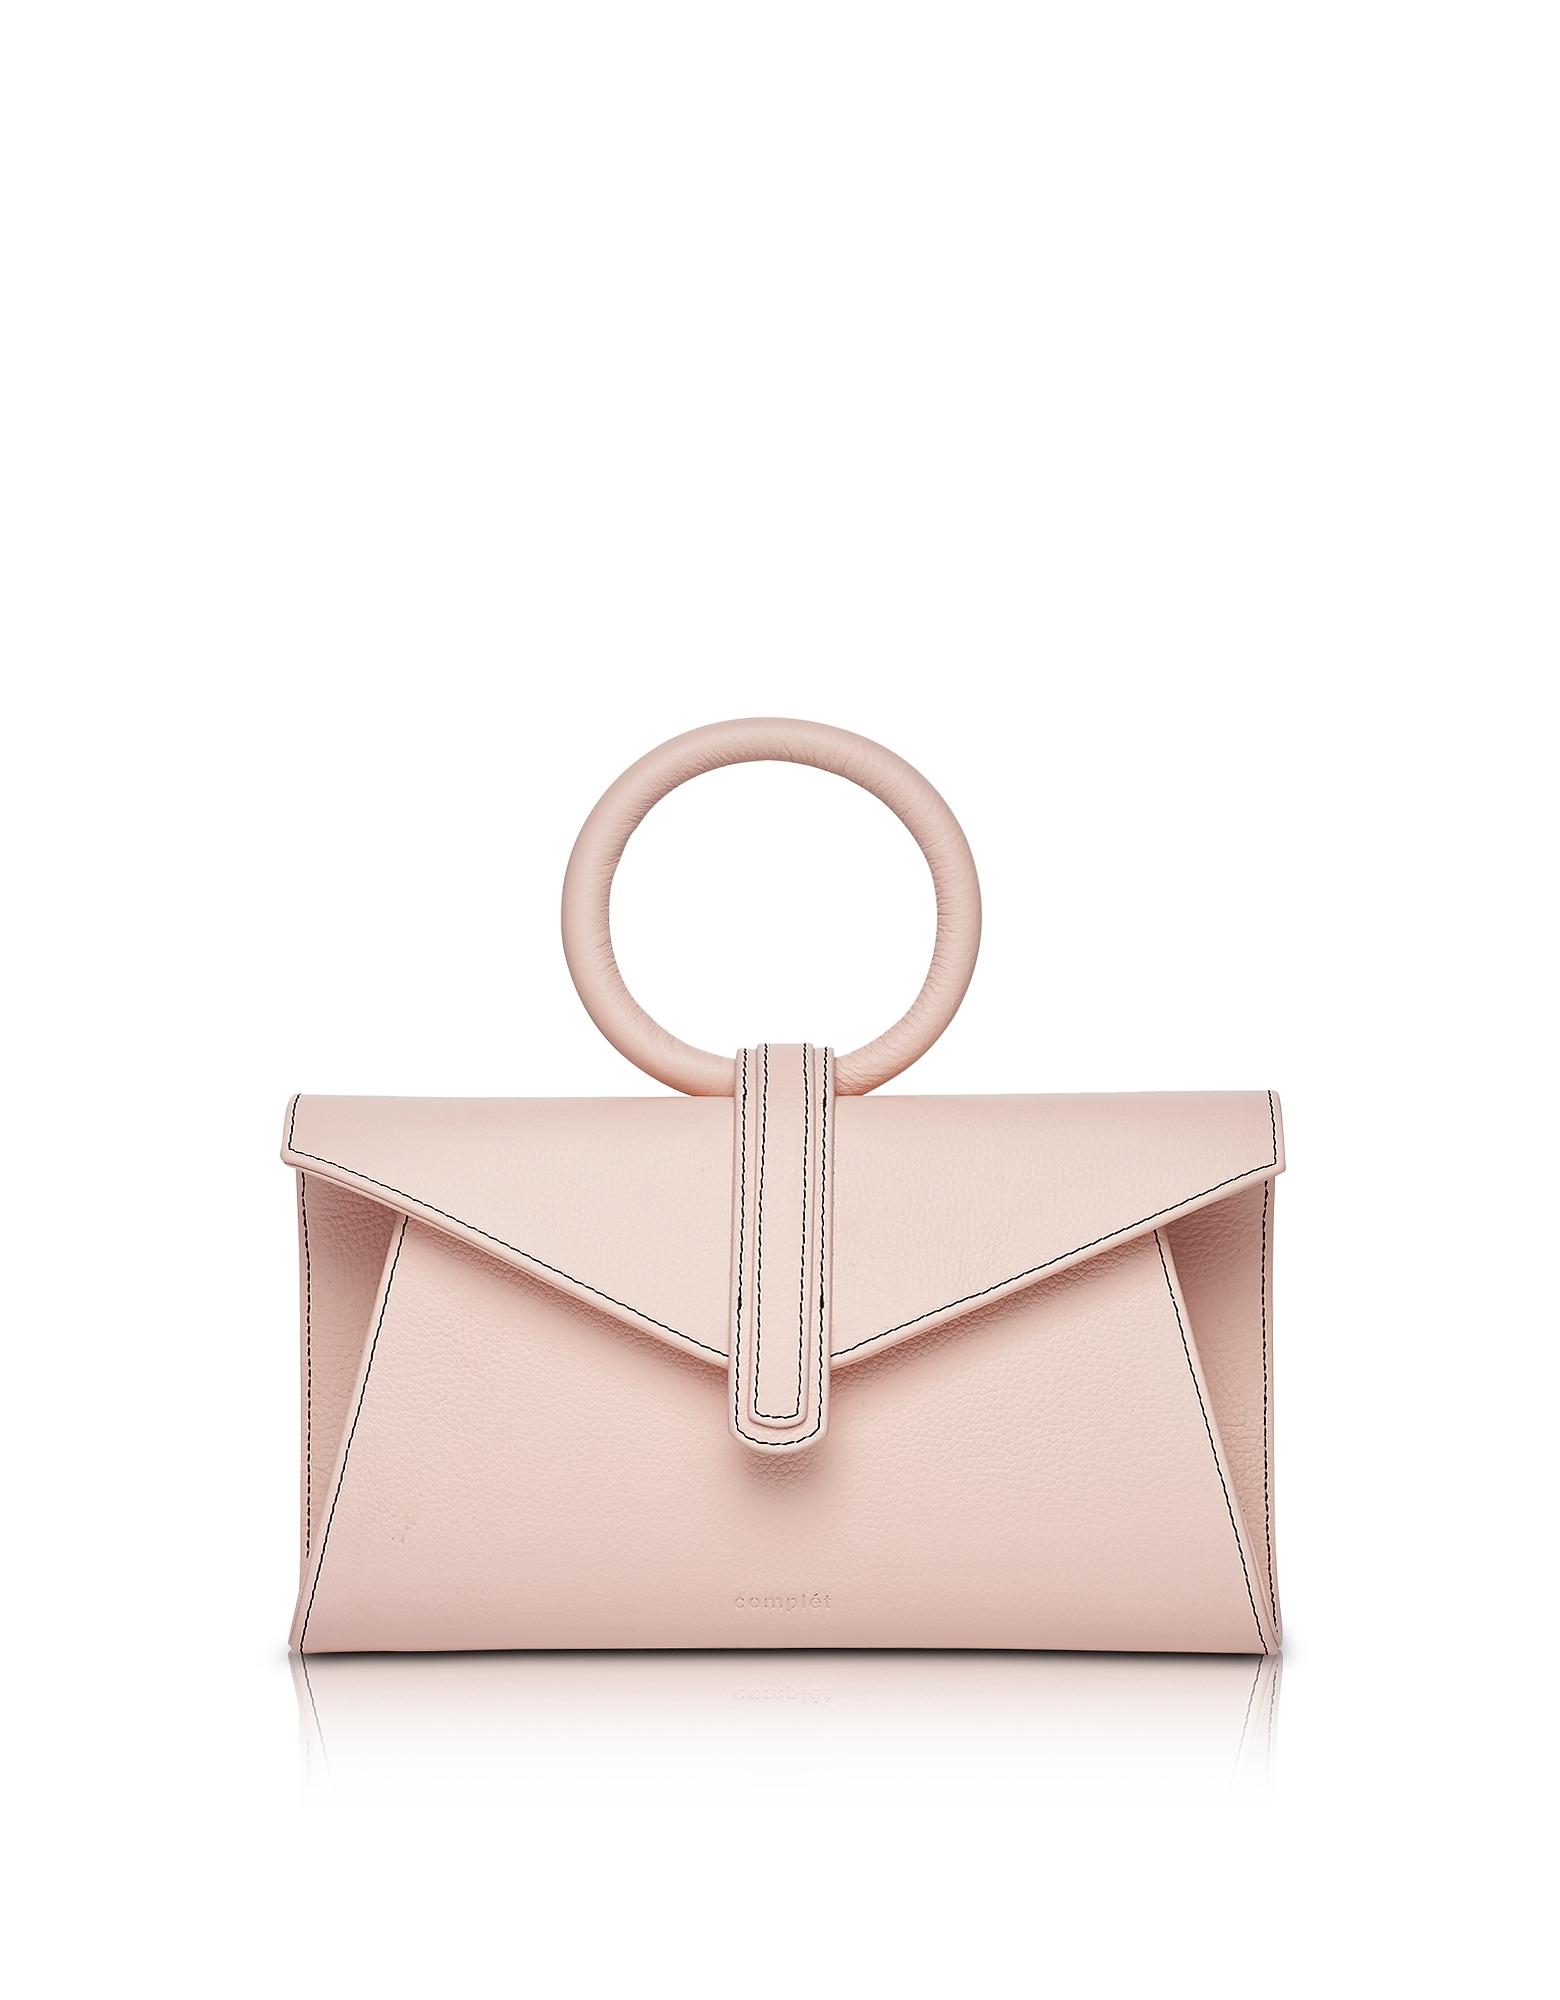 Complet Handbags, Valery Mini Clutch Bag w/Shoulder Strap